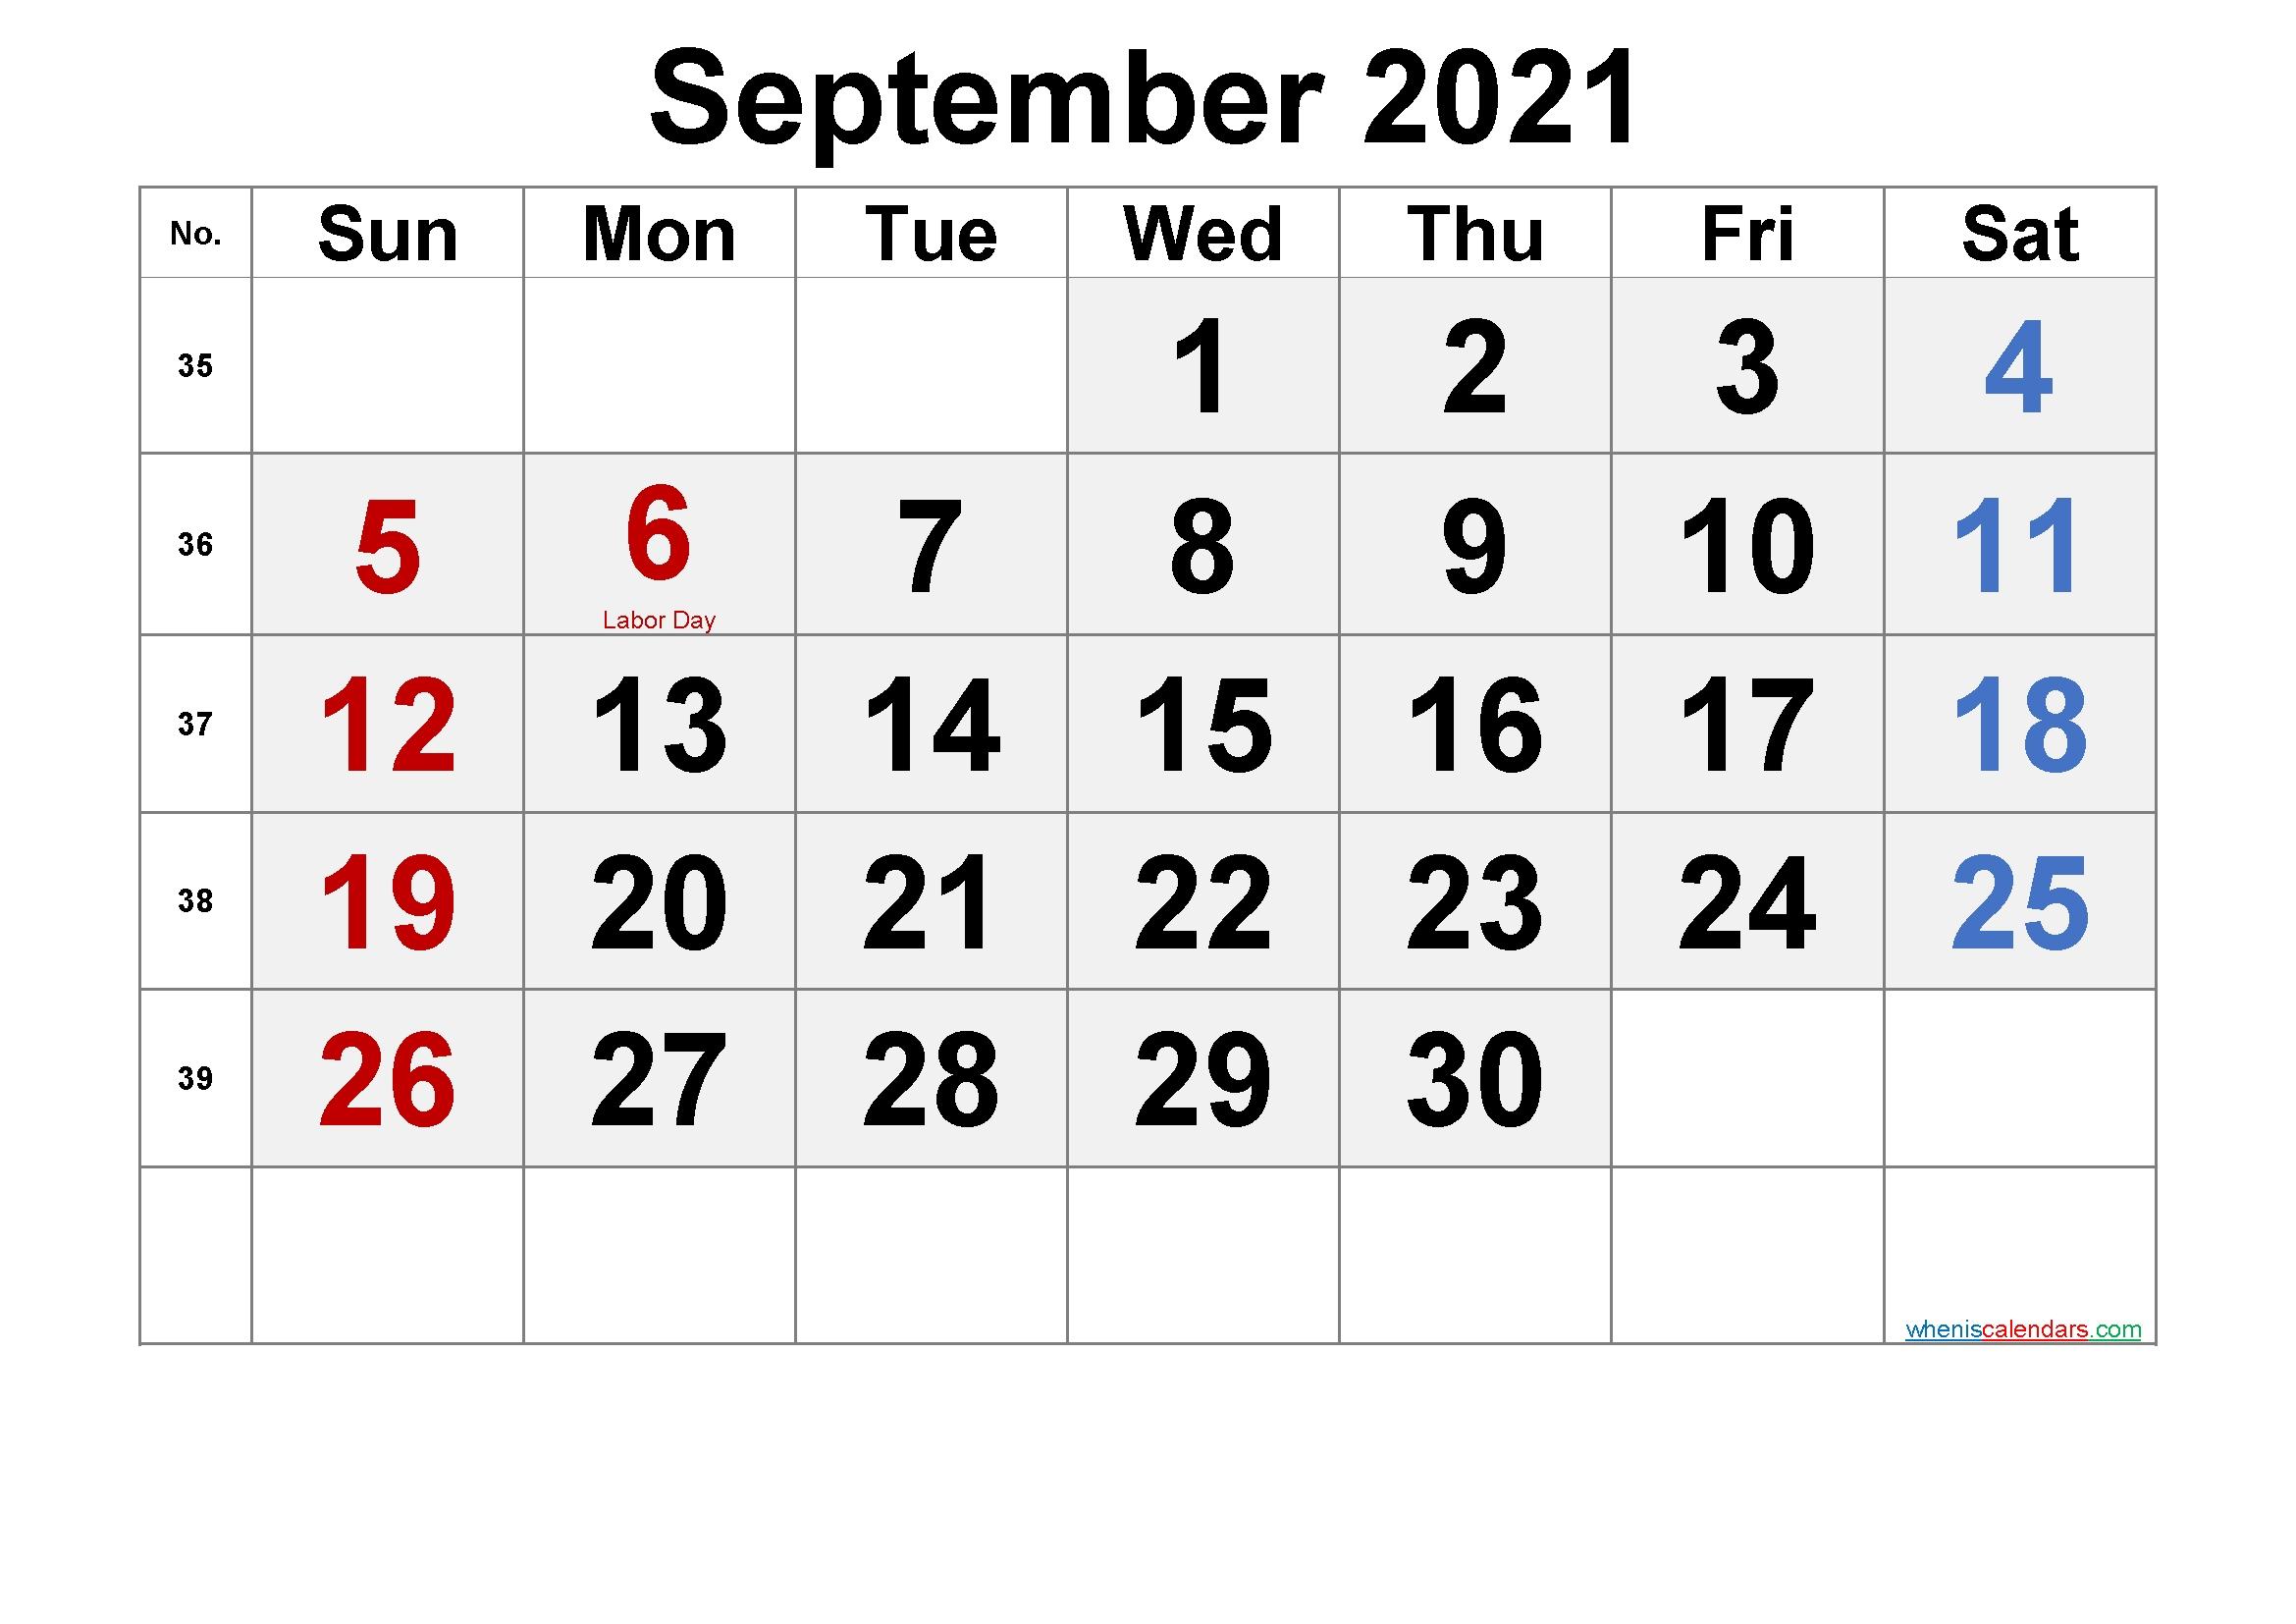 September Calendar 2021 Labor Day | Printable March September 2021 Calendar Template